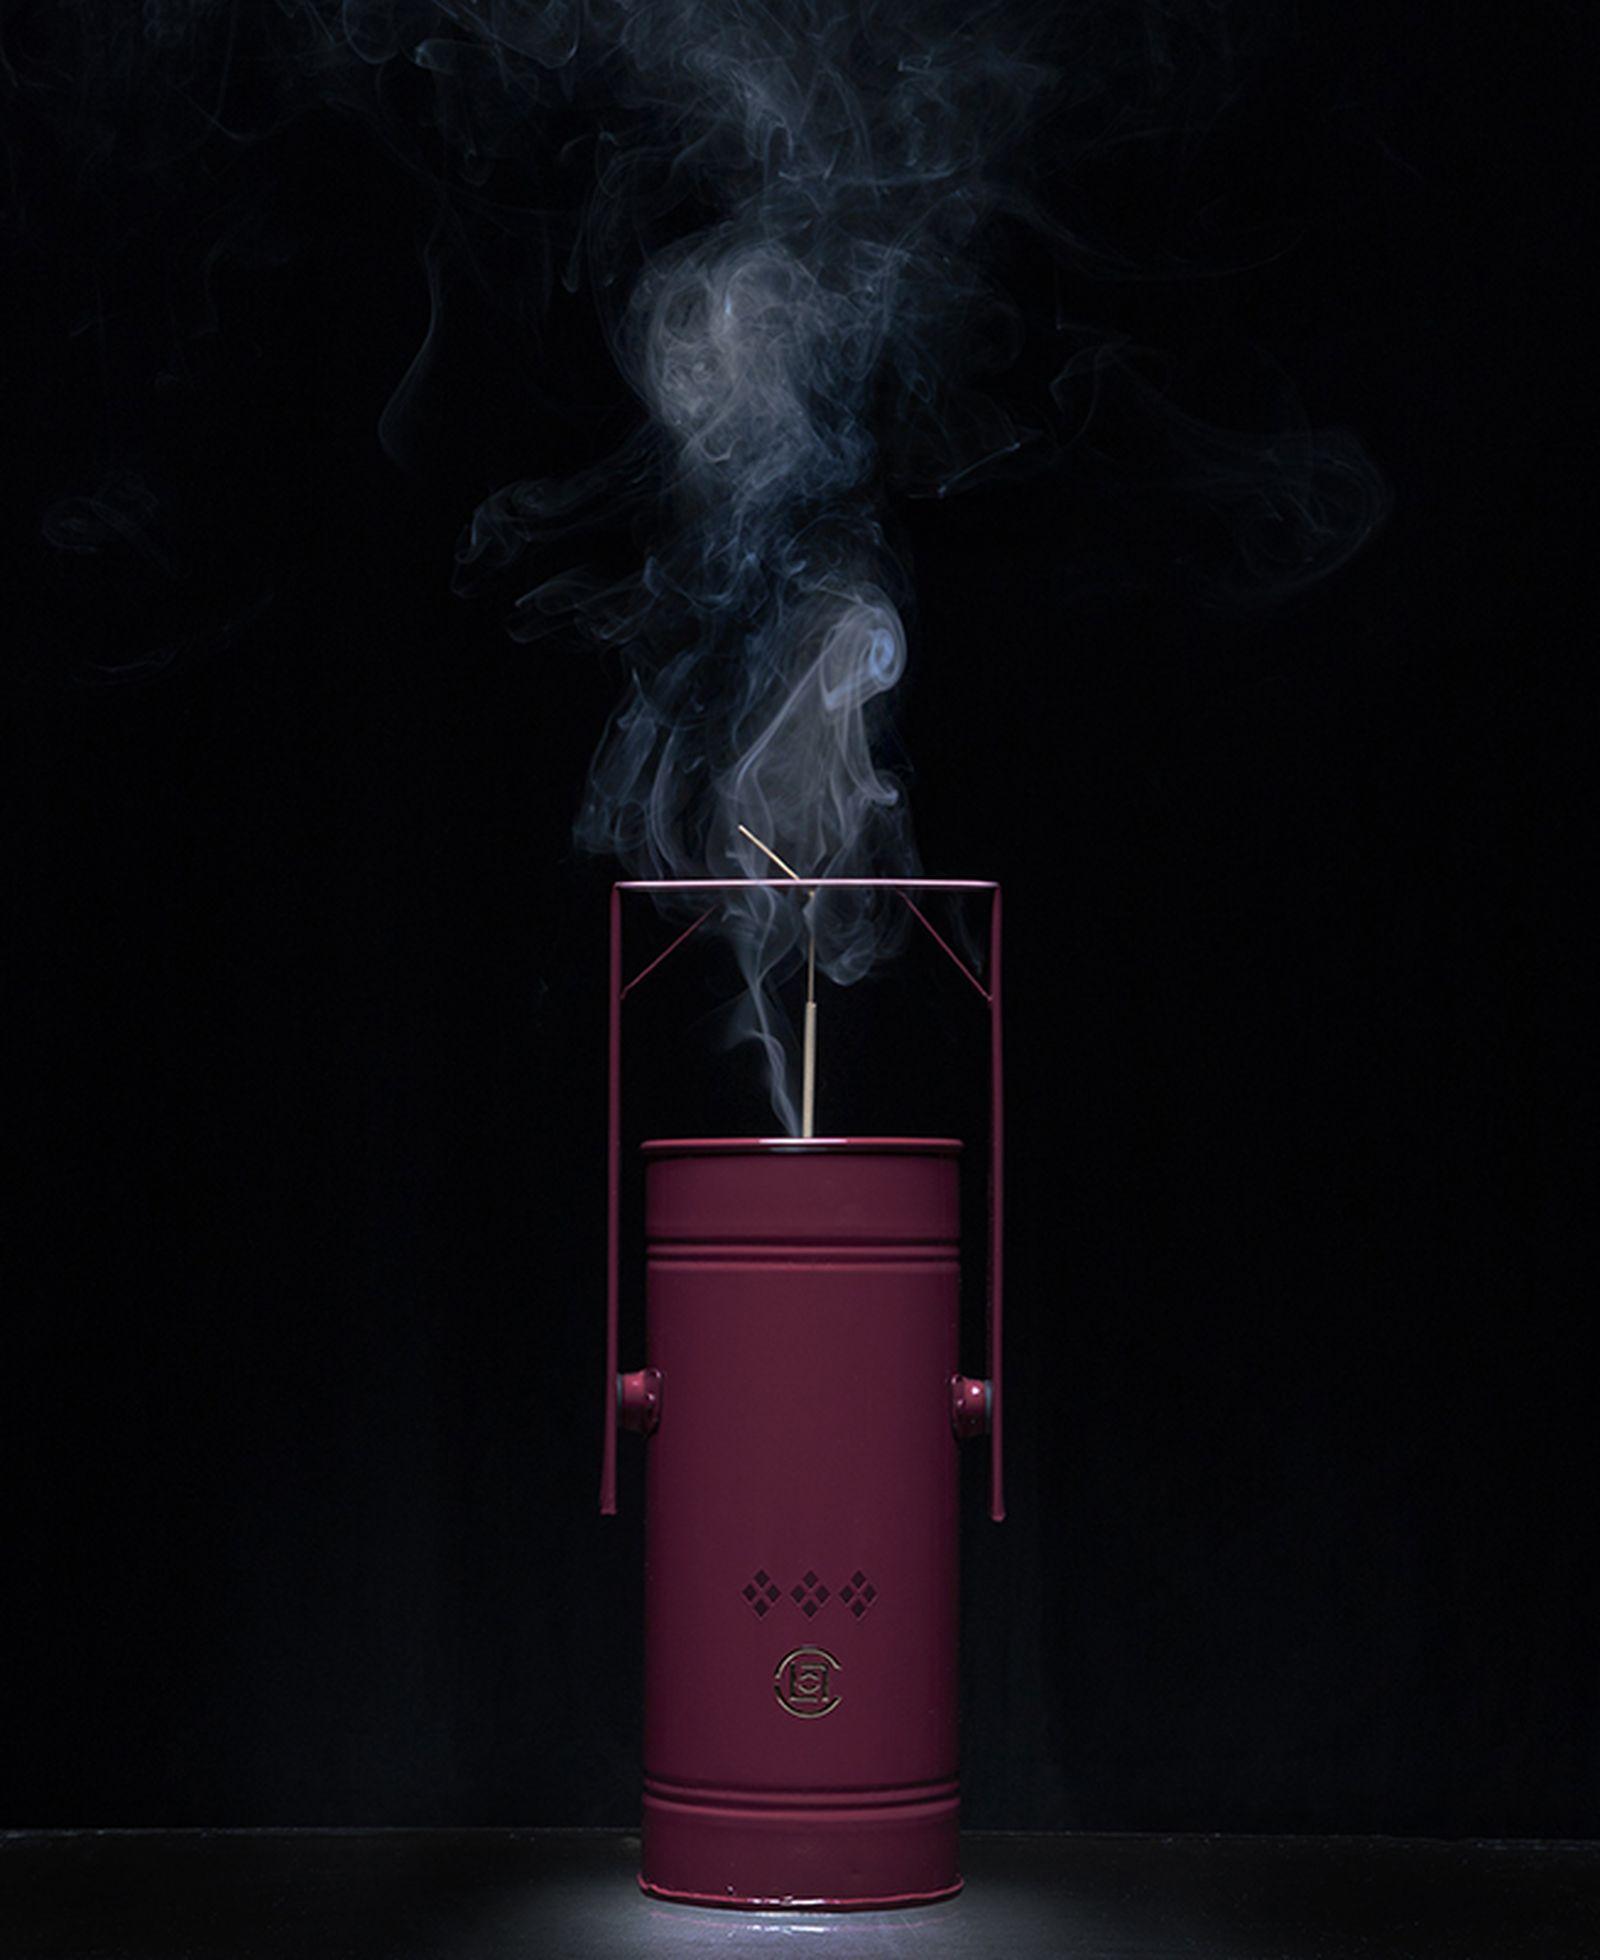 clot kuumba incense burner